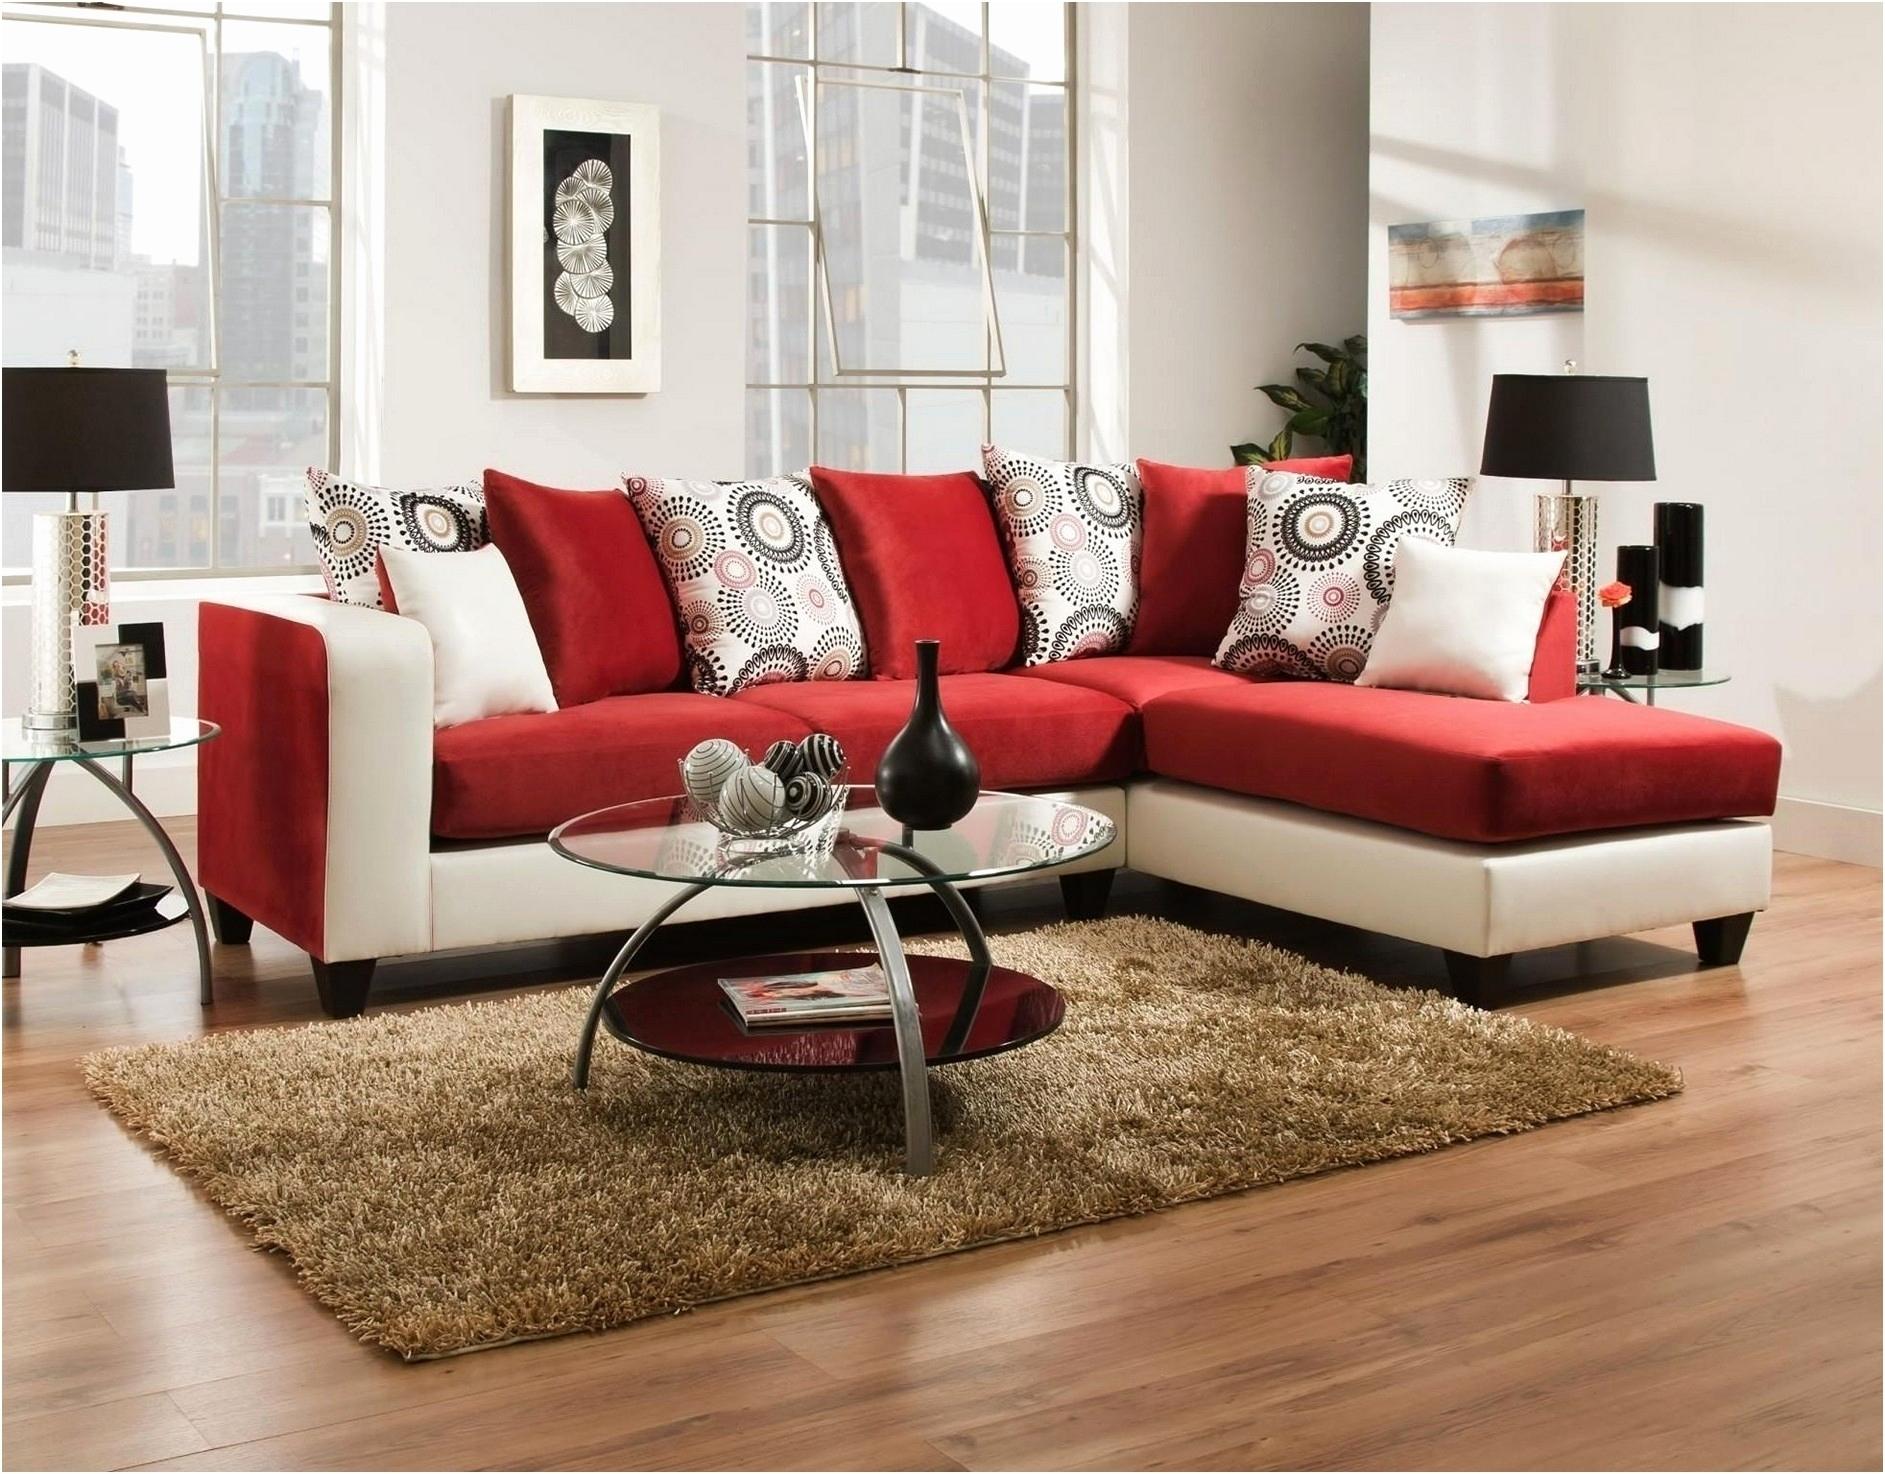 Sofas Under $400 Elegant Cheap Sectional Sofas Under 400 in Sectional Sofas Under 400 (Image 15 of 15)